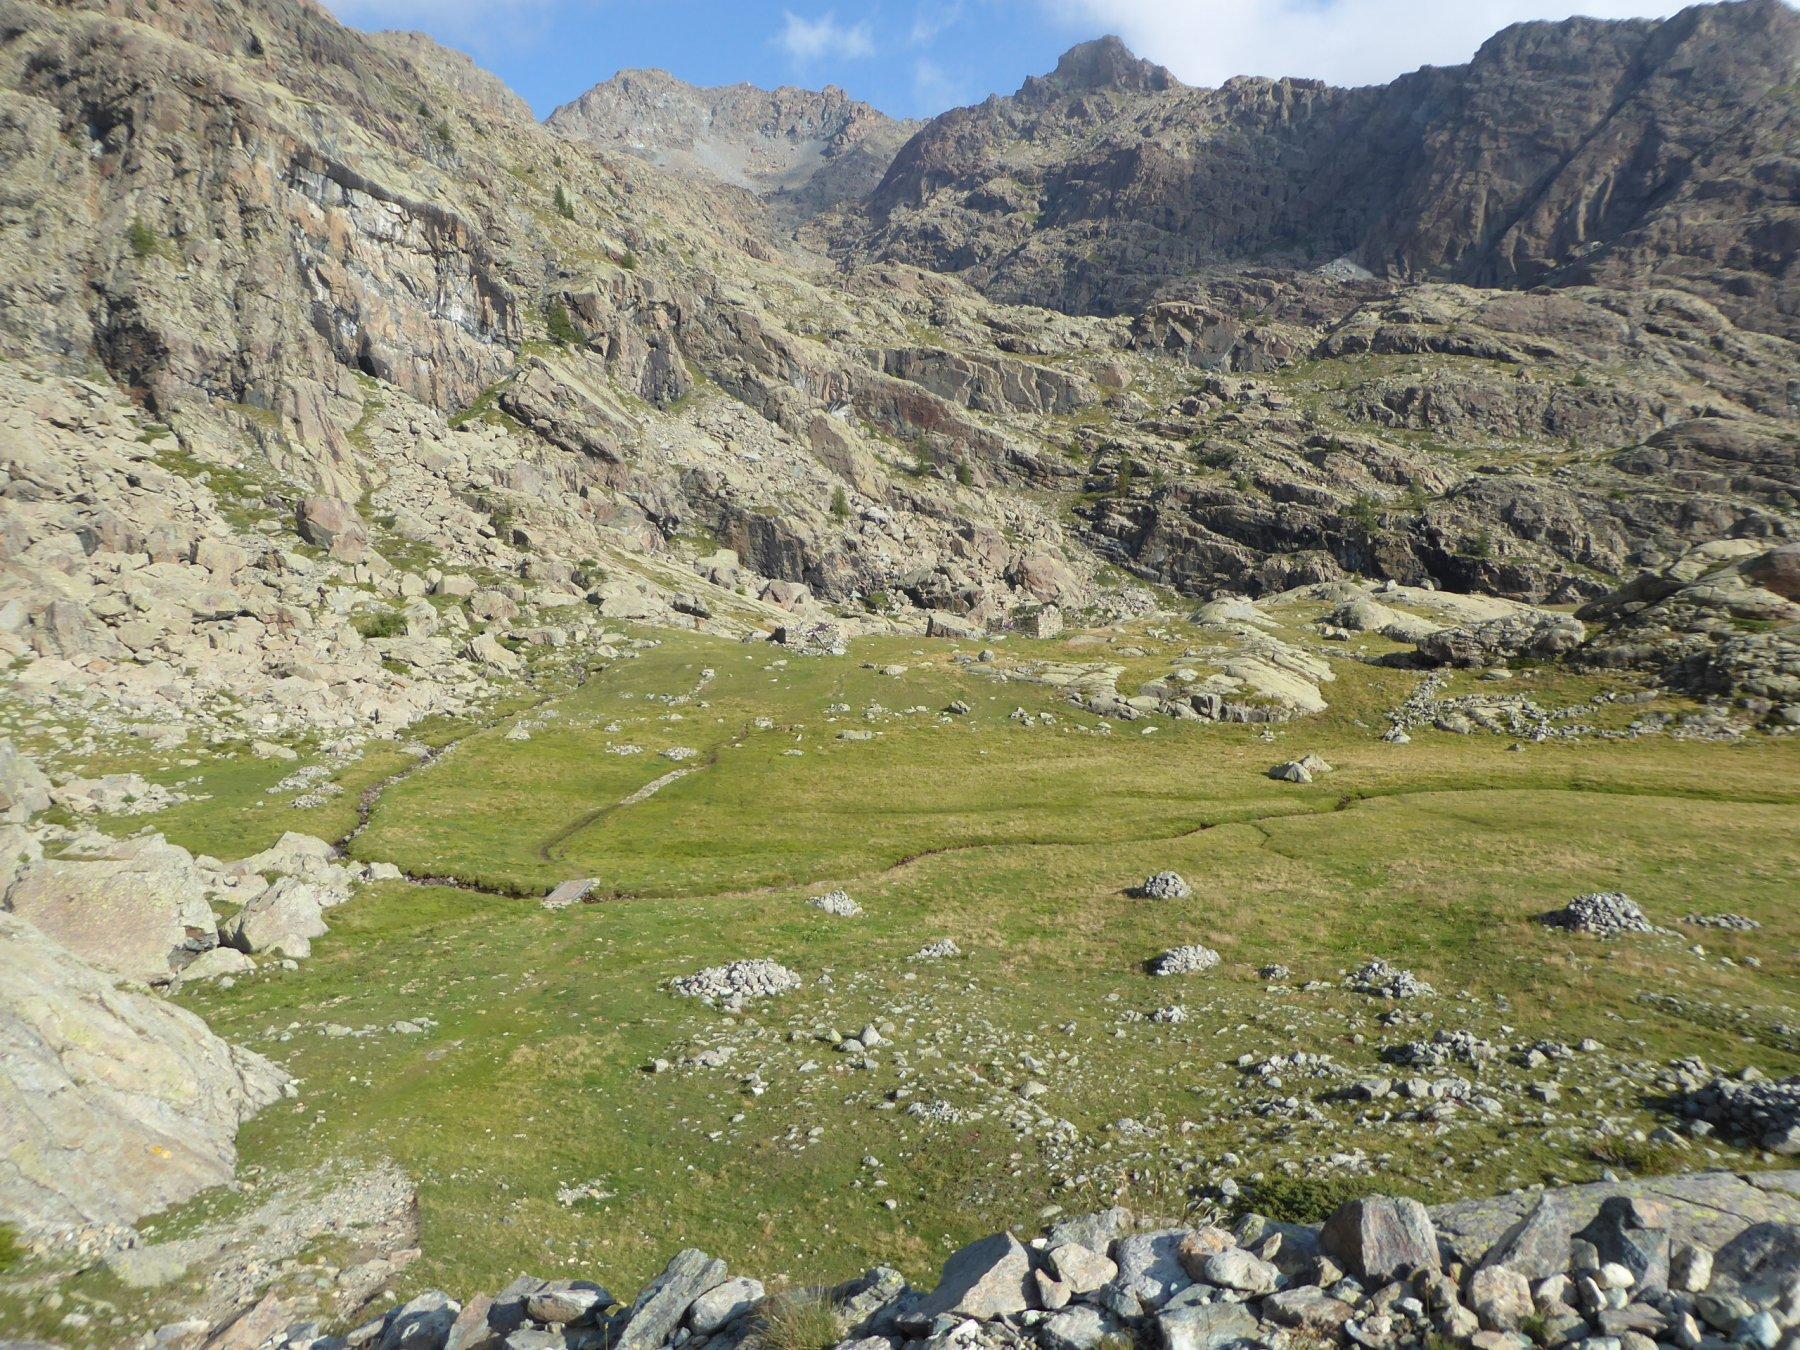 Ivertaz (Monte), Envers du Lac Gelè, Punta di Mezove da Mont Blanc per il Rifugio Barbustel e i laghi del parco Avic 2019-08-31